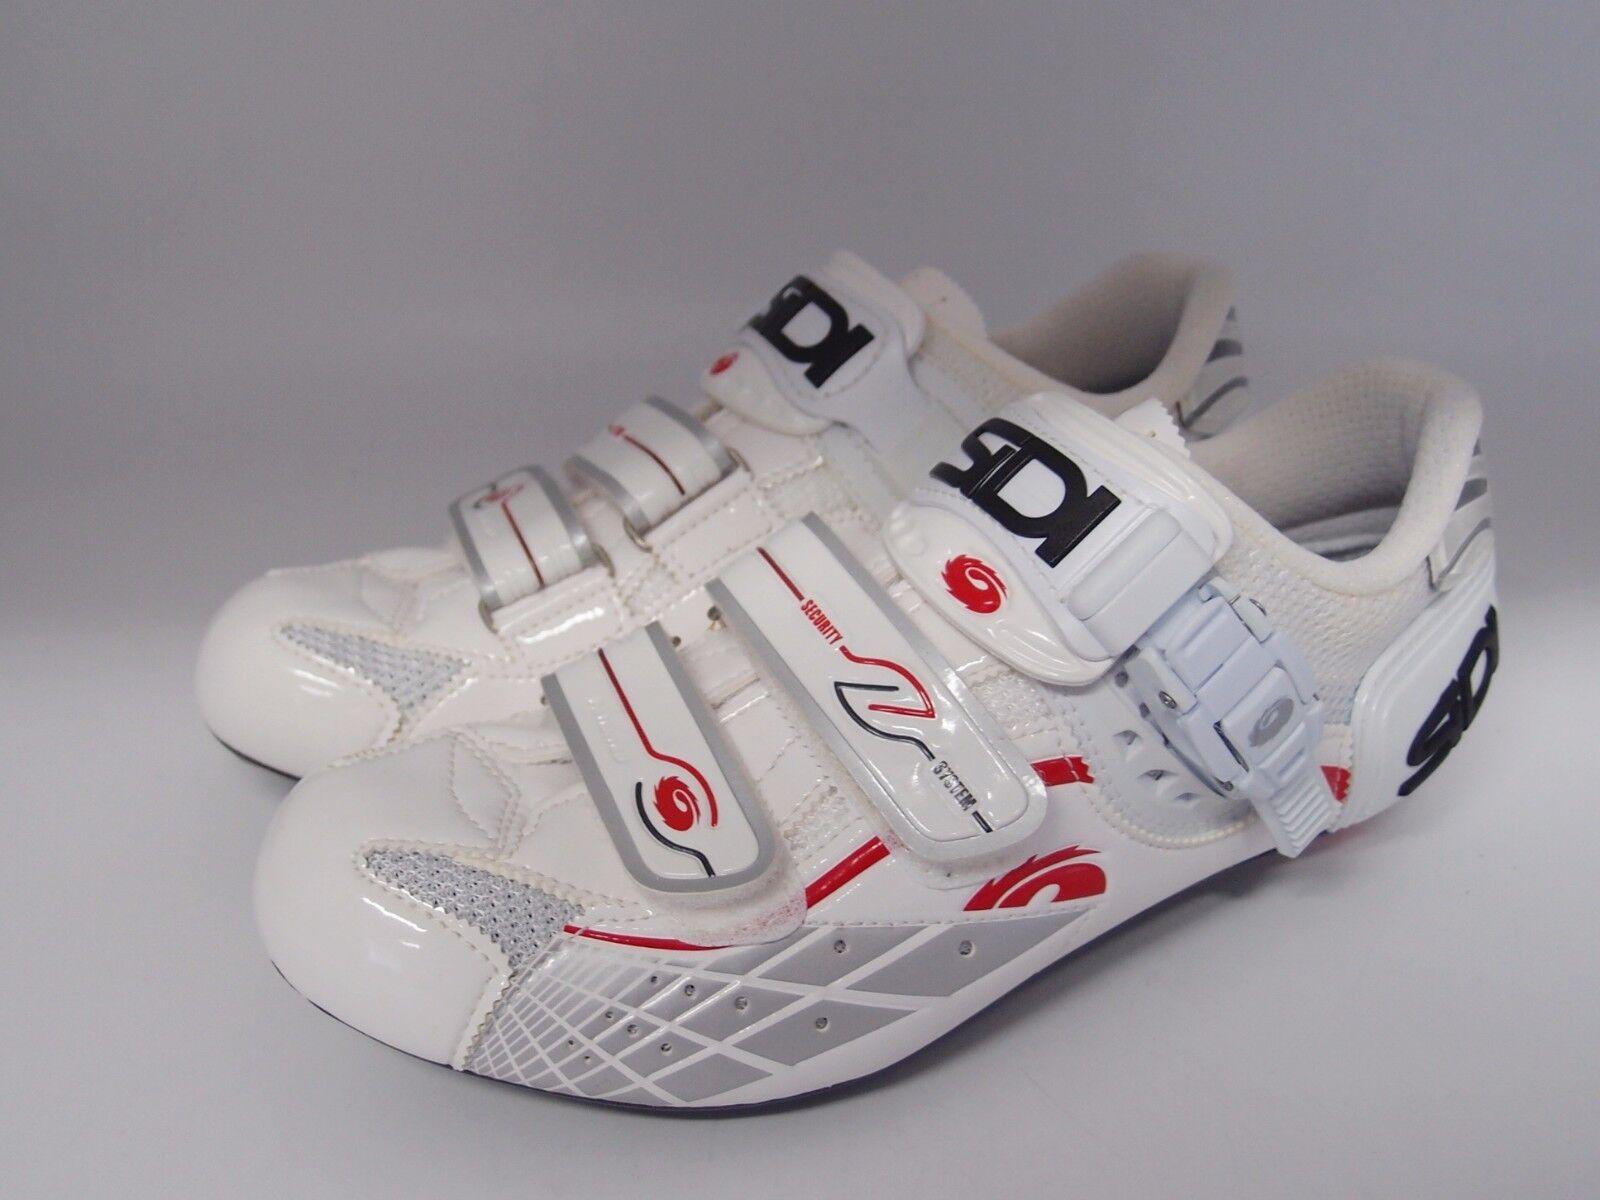 SIDI láser VERNICE blancooO road cycling zapatos EUR 40.5 US 7.25 cm 25.25